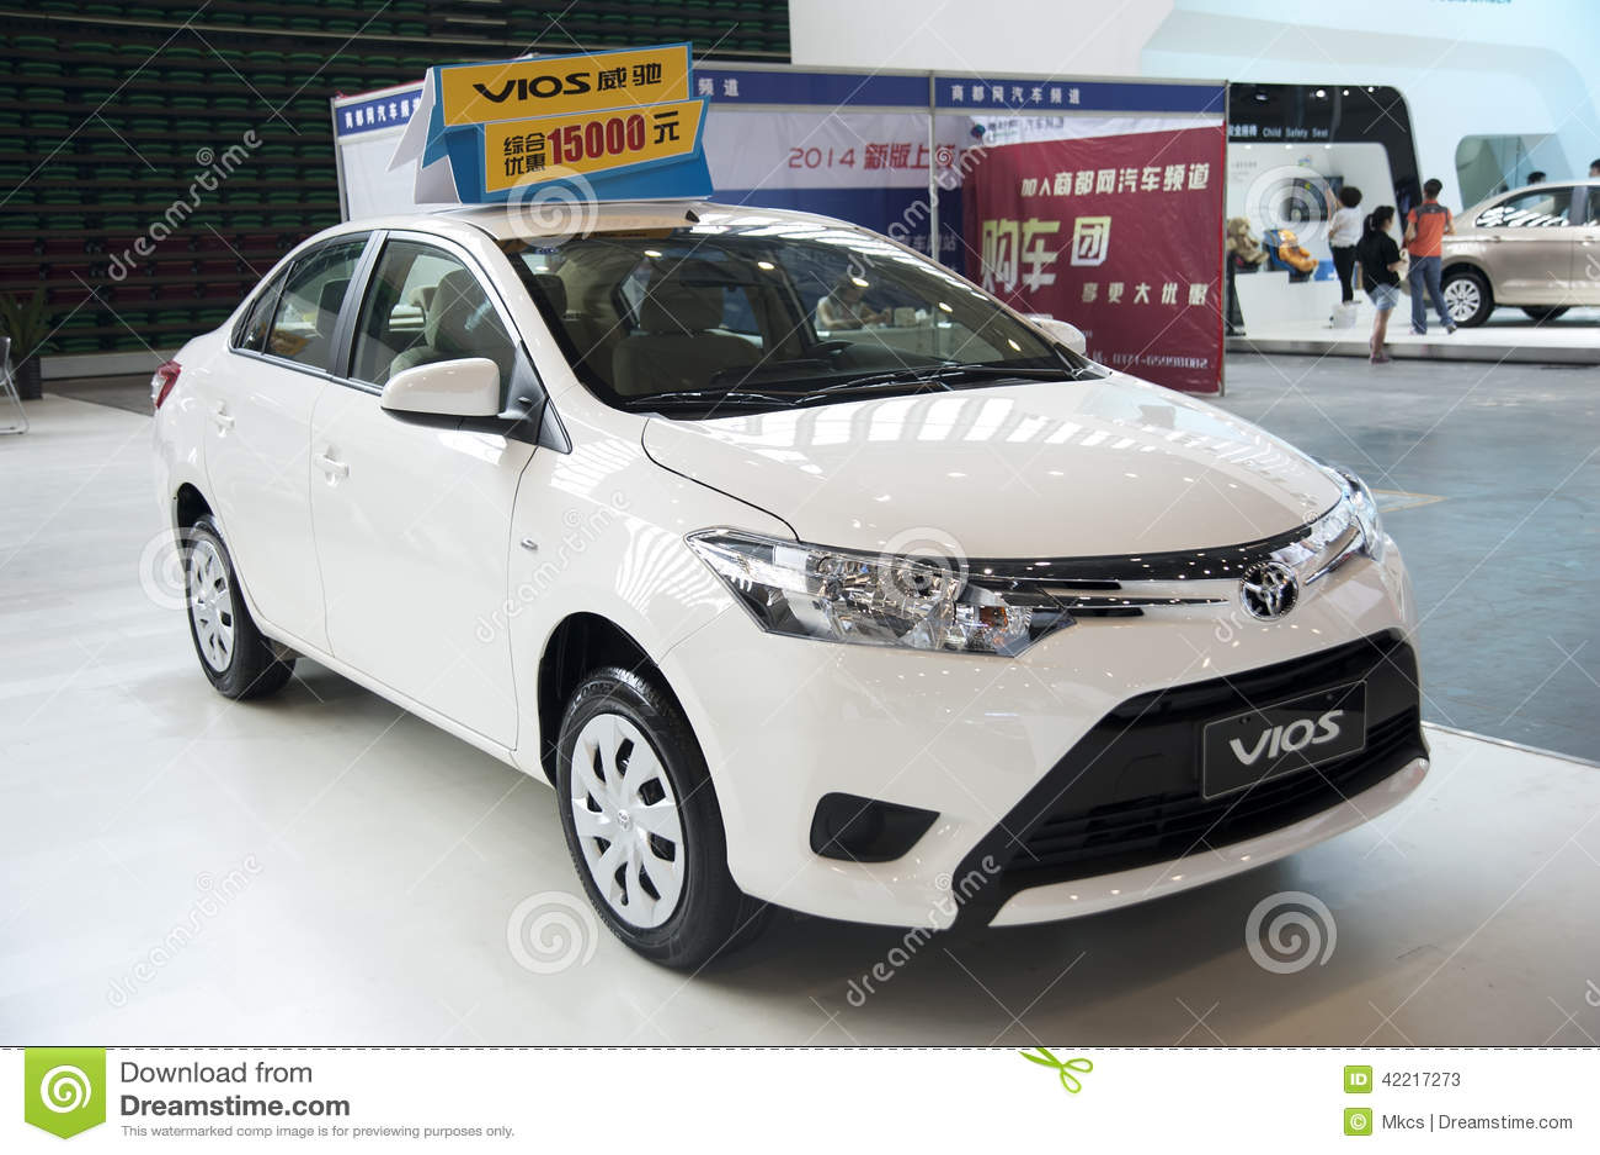 white-toyota-vios-car-central-china-international-auto-expo-42217273.jpg